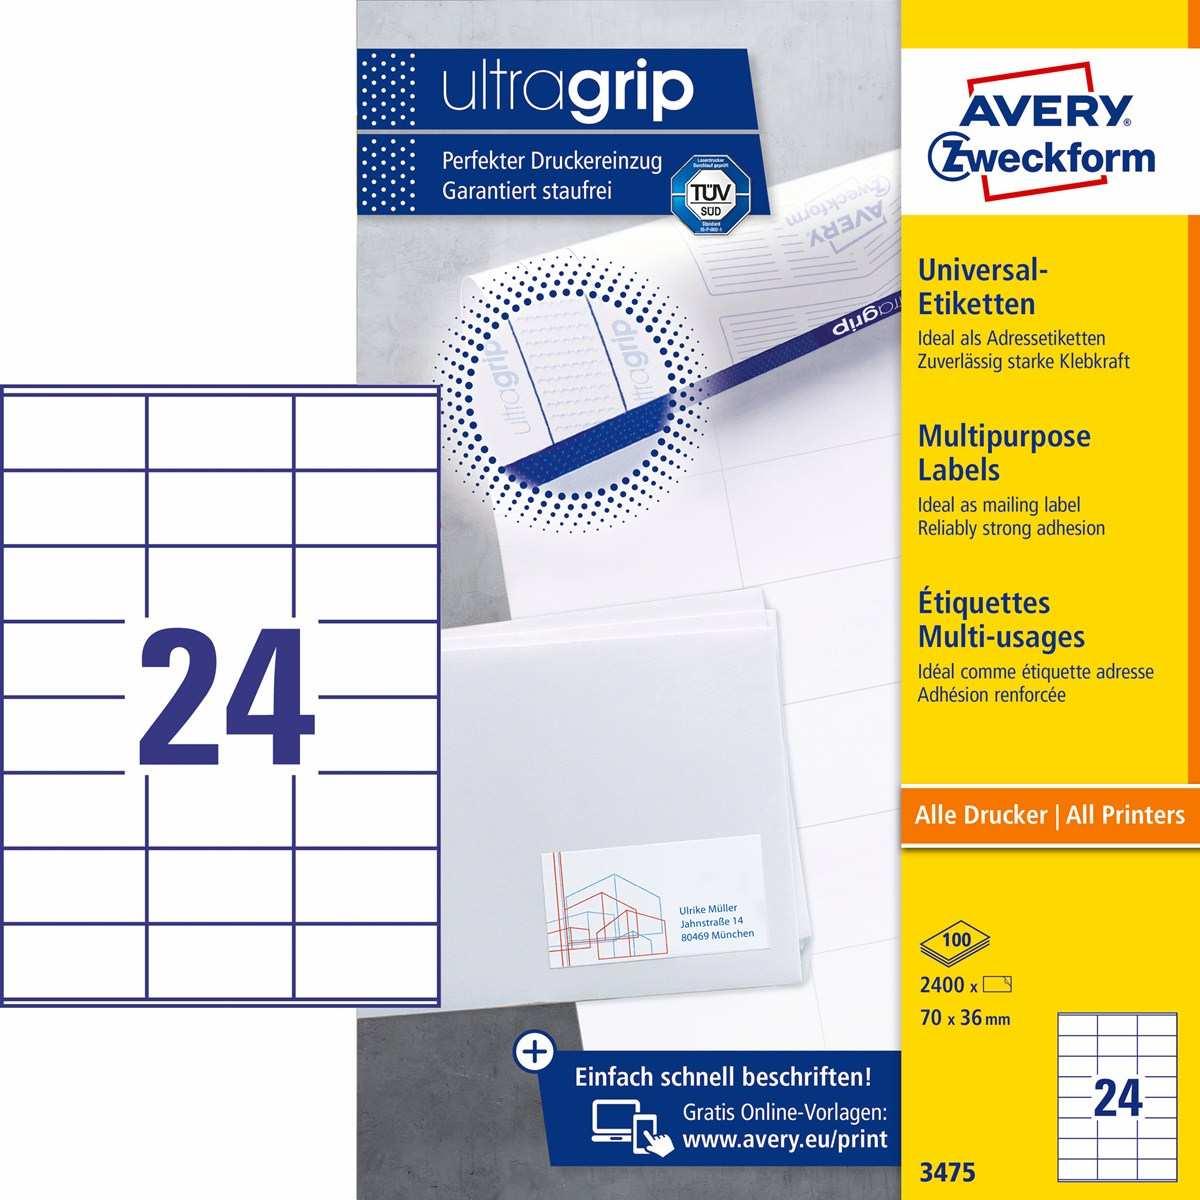 Avery Zweckform 3475 Universal Etiketten 70 X 36 Mm Weiss